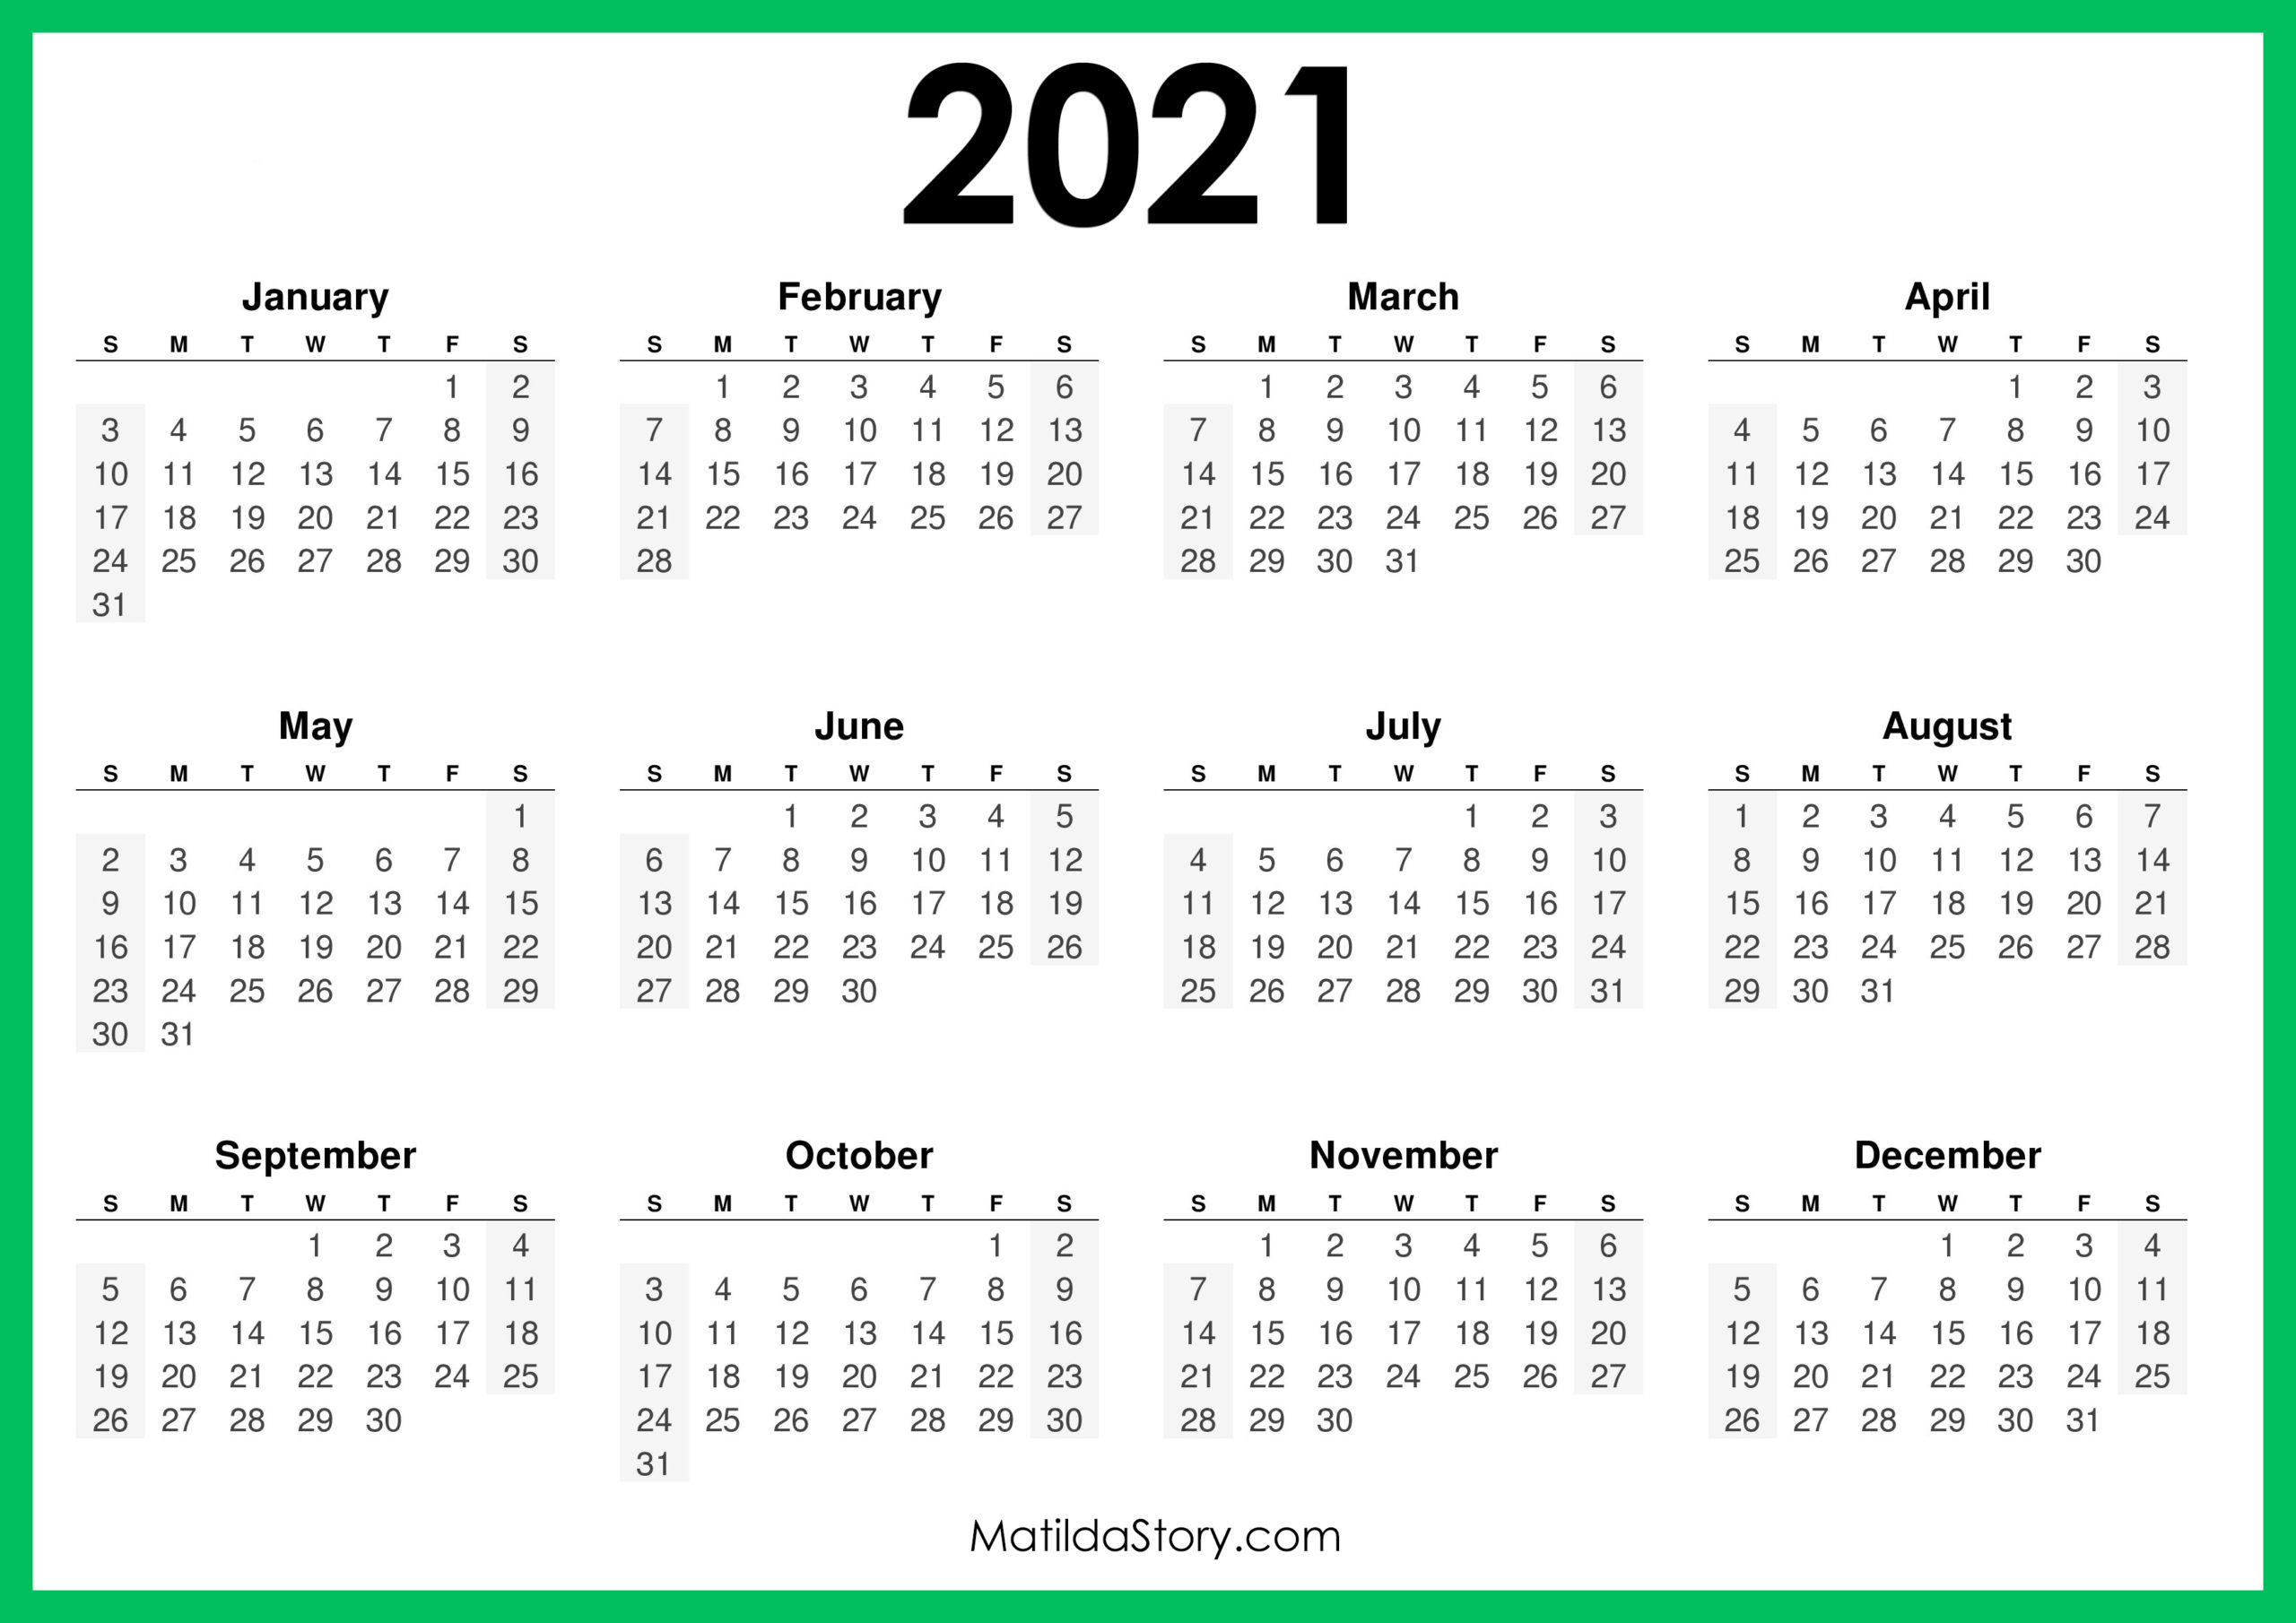 2021 Calendar Jpg 2021 Printable Free Calendar, Horizontal, Green – Sunday Start, HD